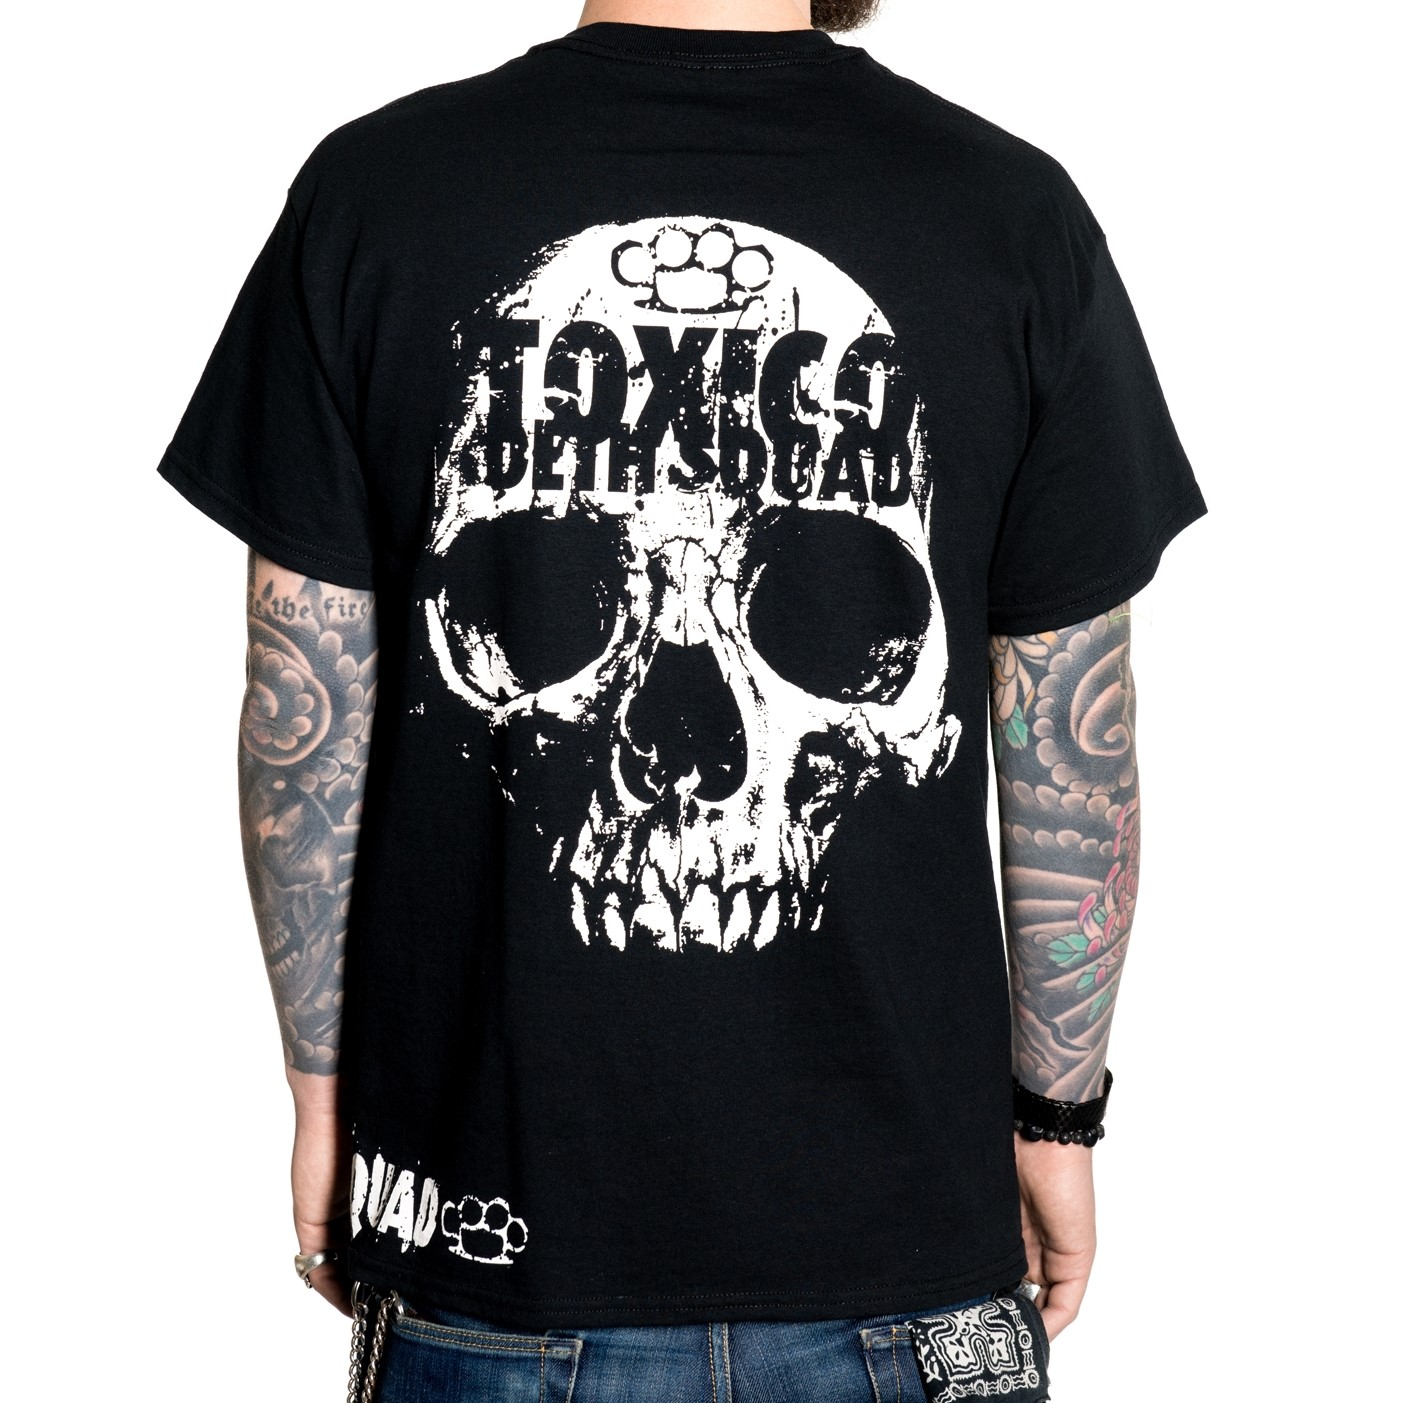 camiseta ropa calaveras rock tattoo style alternativa gotica 13depicas online custom